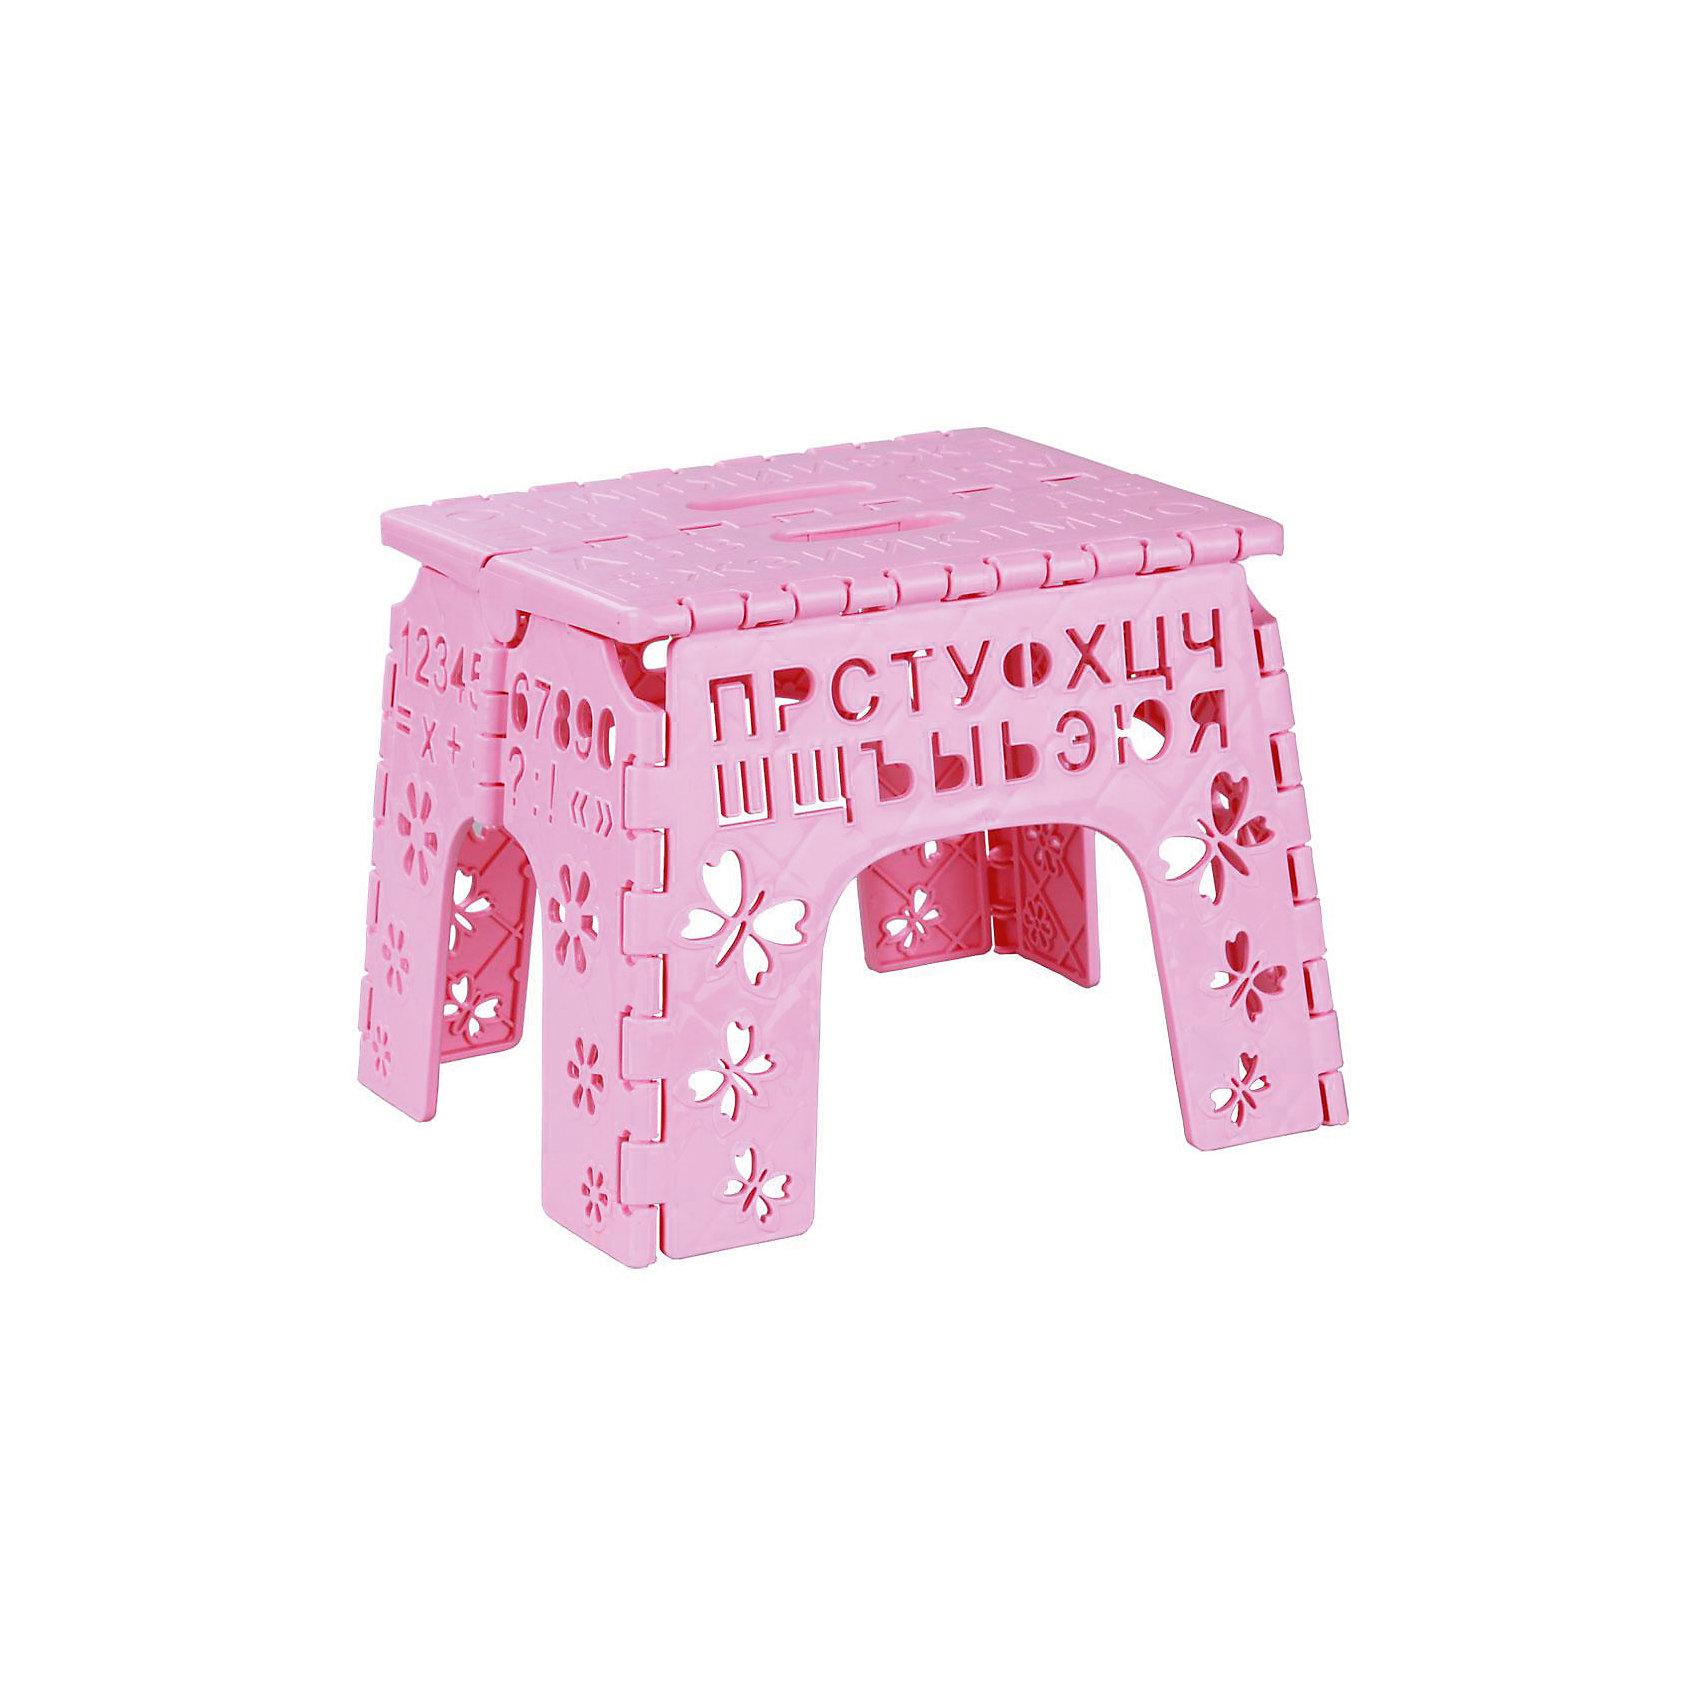 Alternativa Табурет складной детский Алфавит,  Alternativa, розовый табурет пластмассовый красный